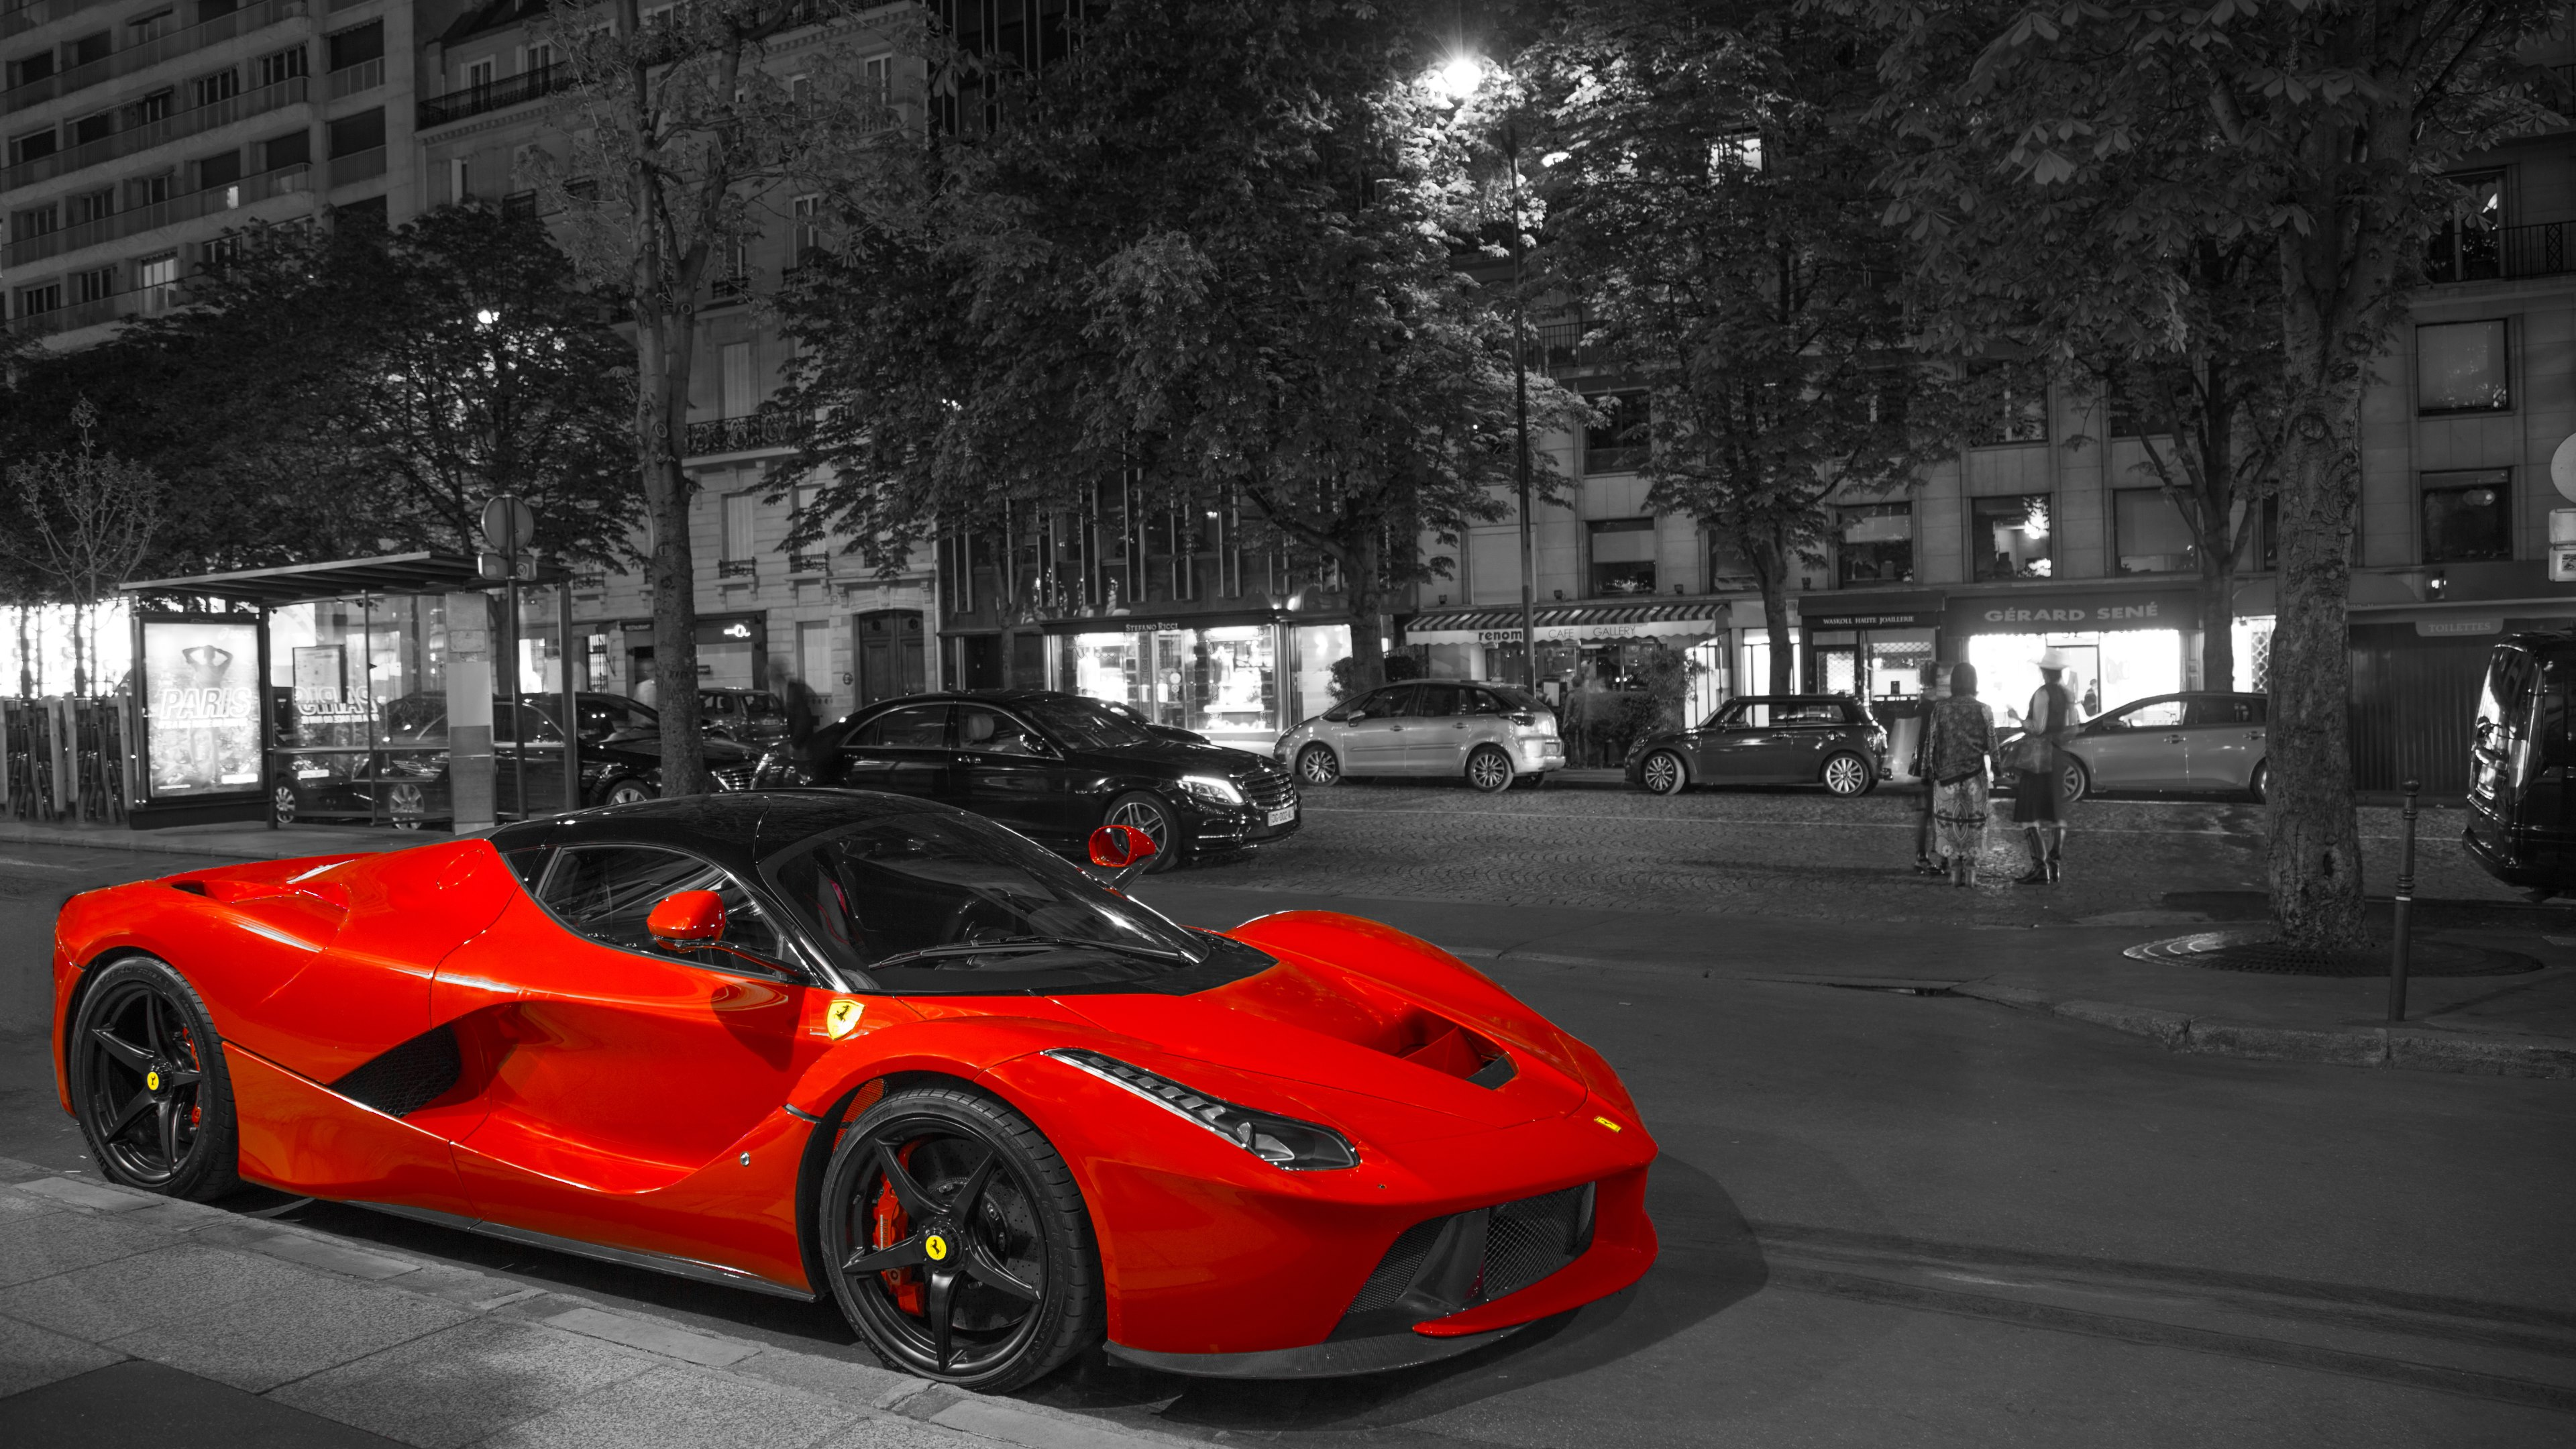 Red Ferrari Car Wallpapers Wallpaper Cave